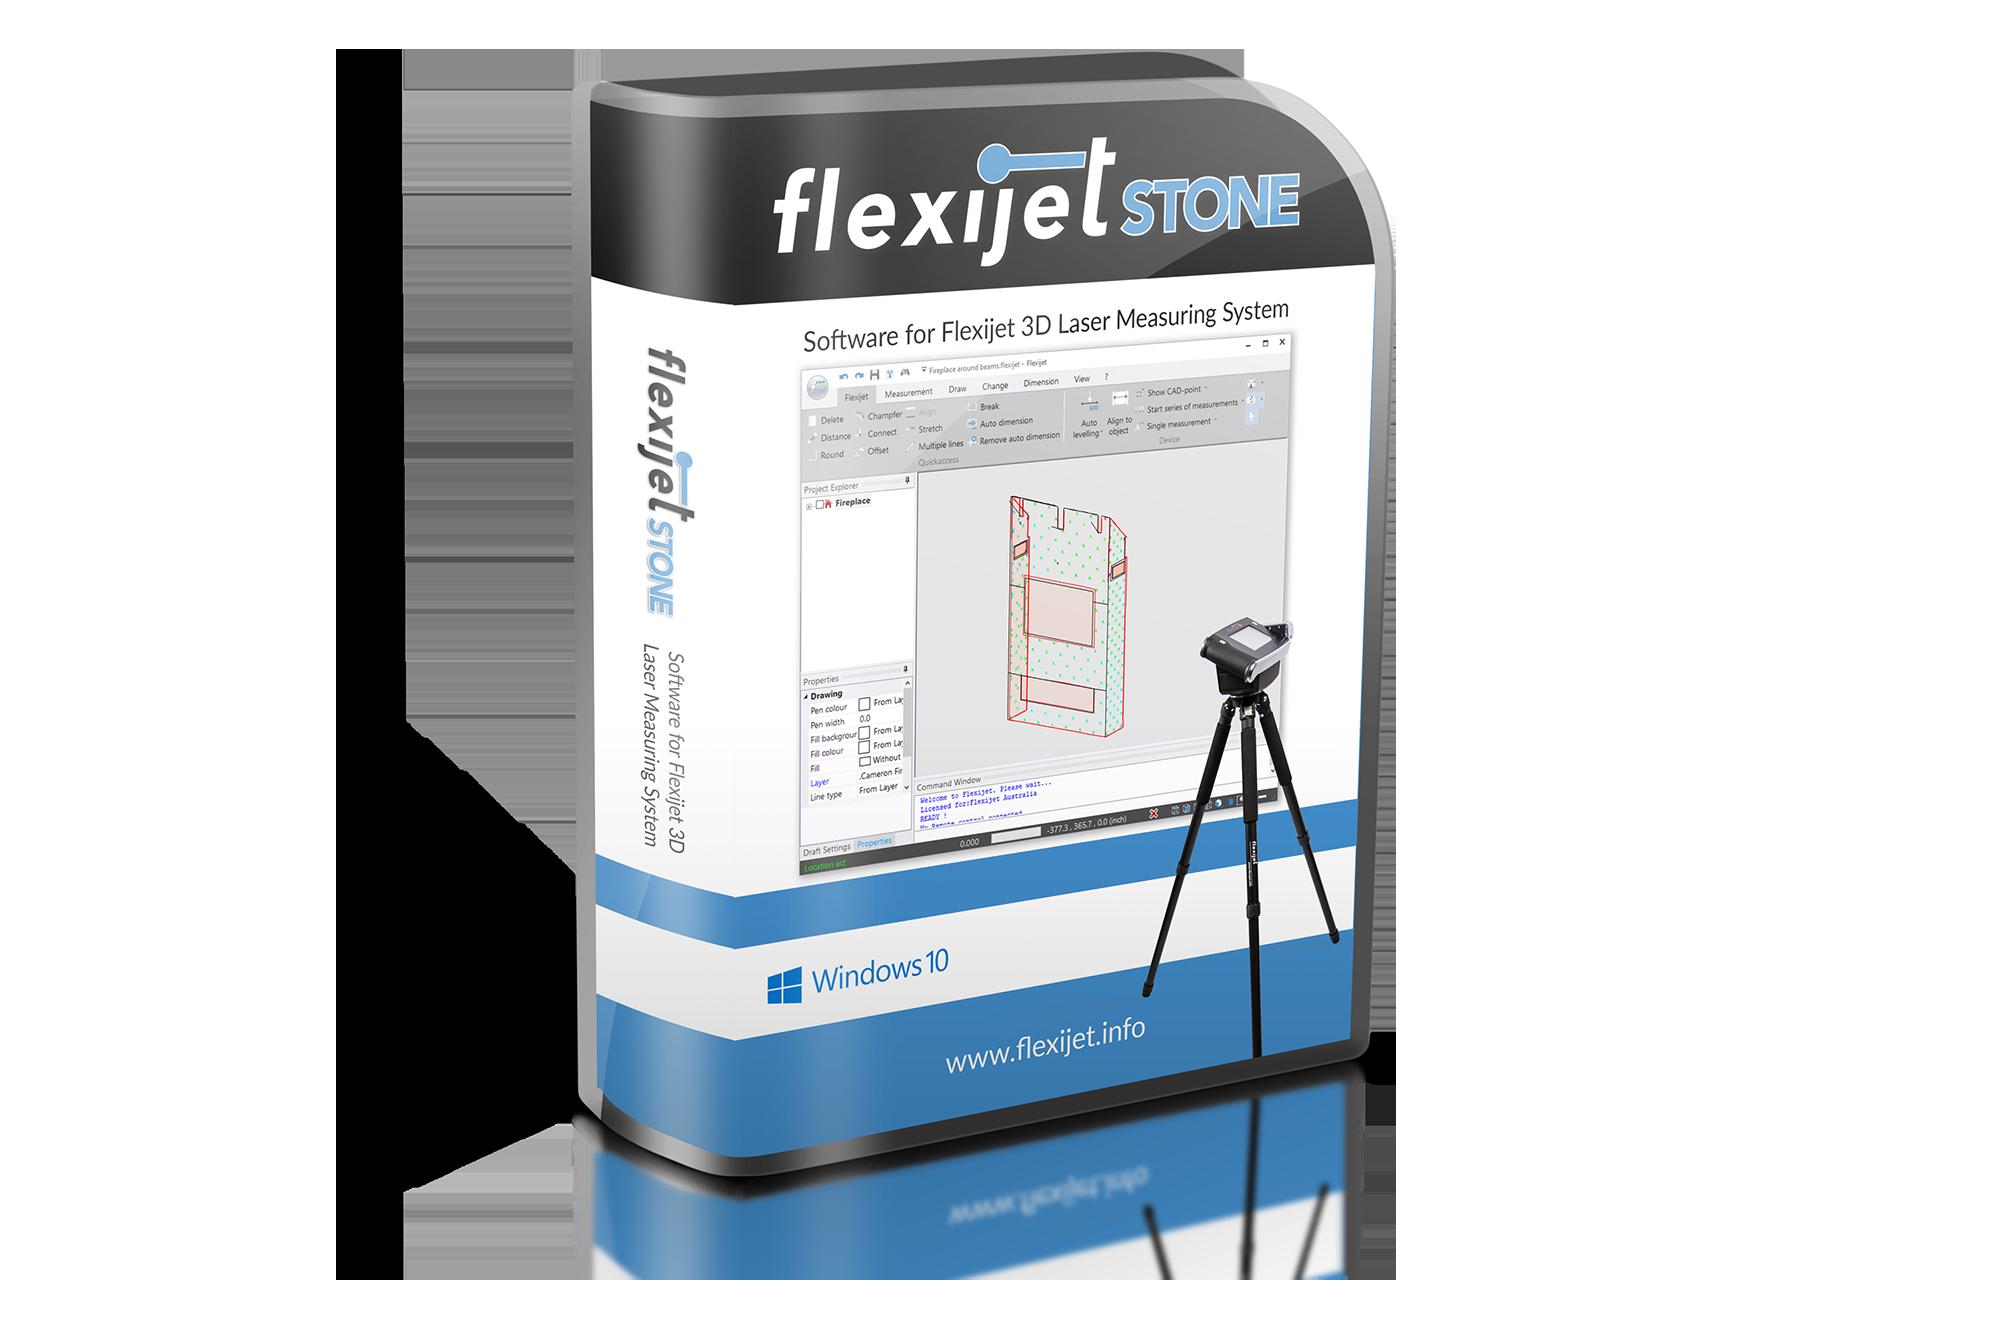 Illustrative image of package for Flexijet STONE software.